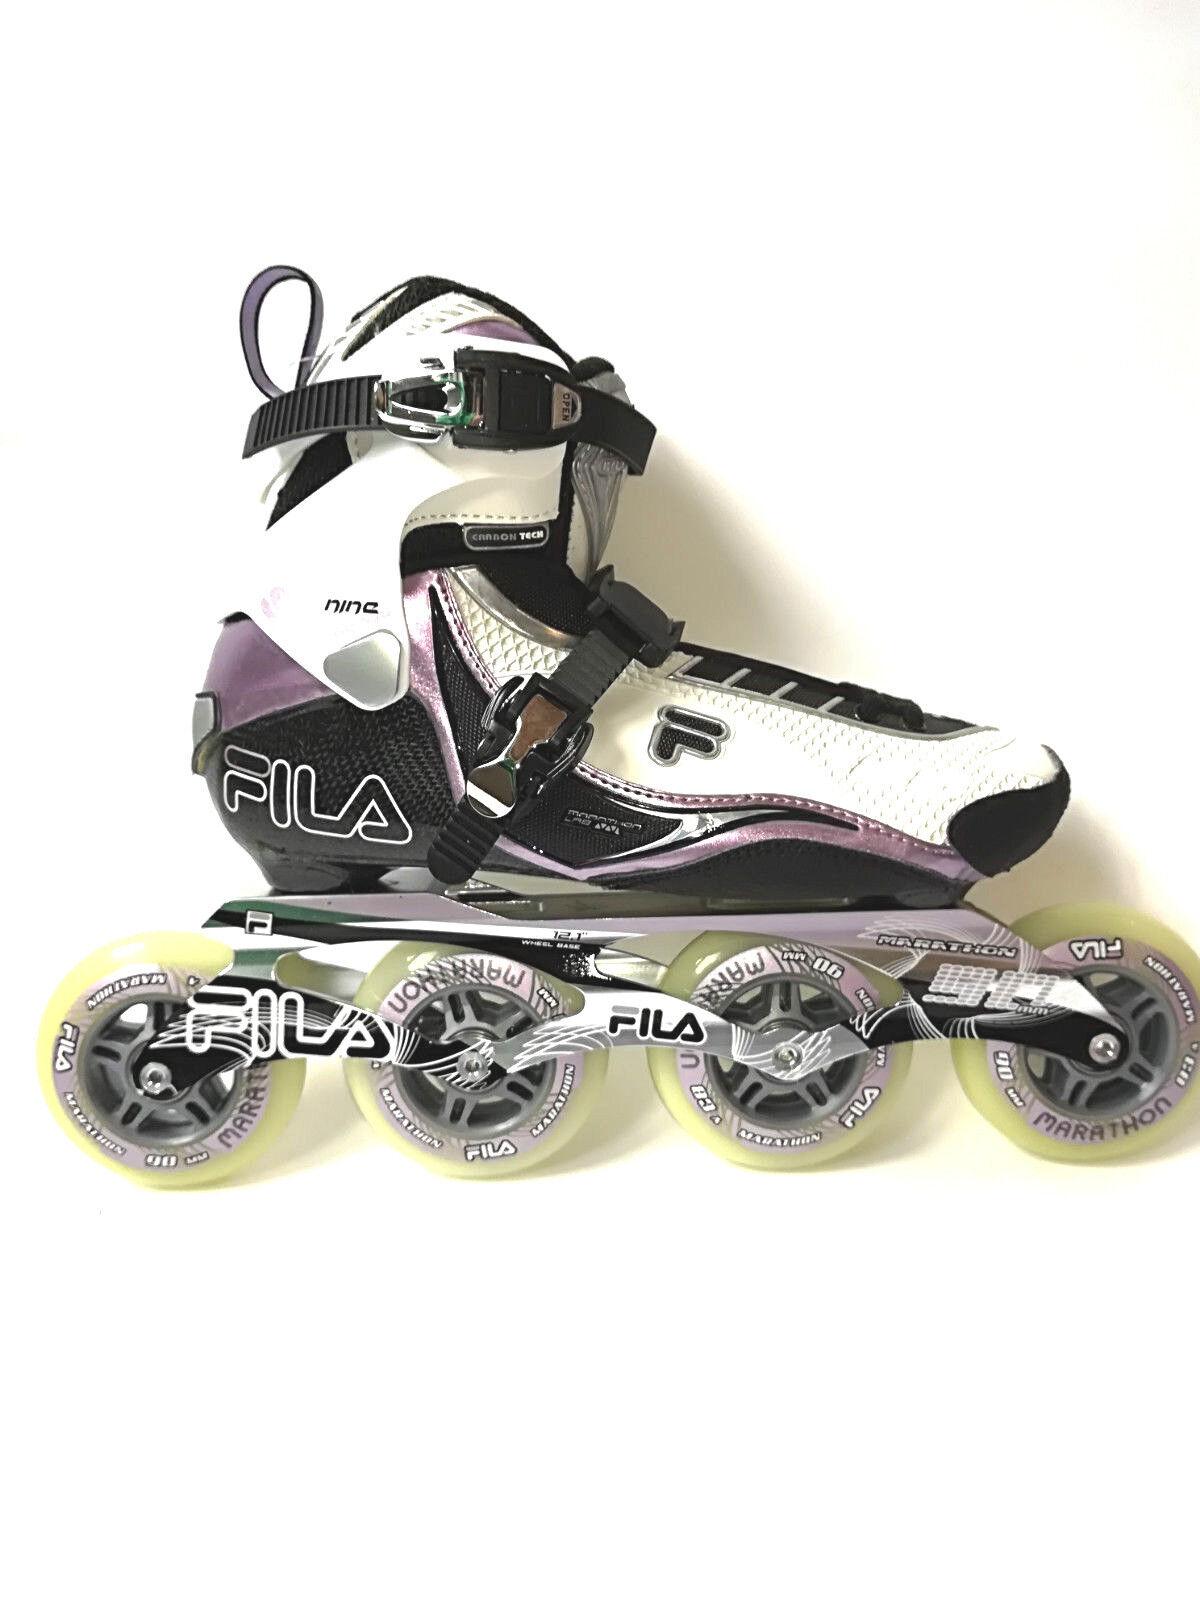 Fila Nine 90 Lady Weiß lila Speedskate Marathon  Speedskate lila Inliner Skates 1025 Gr. 40 9b0c53